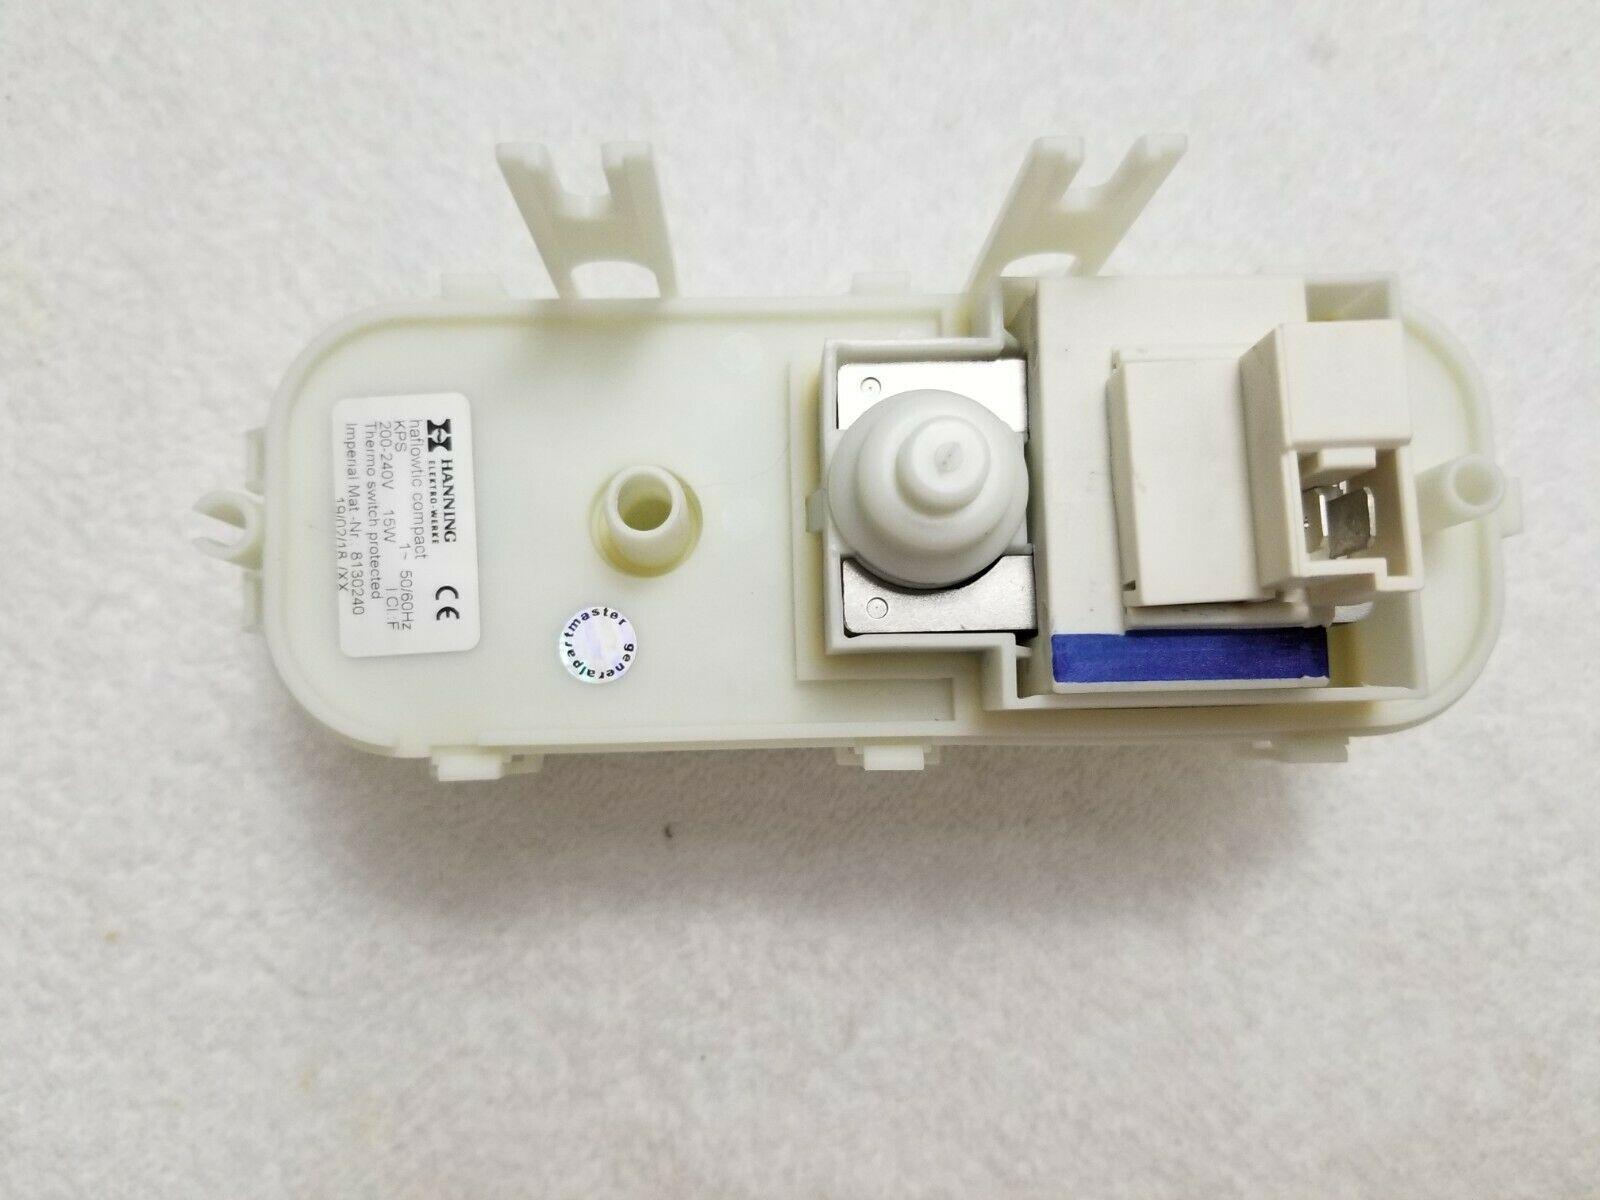 Miele Dishwasher Pump water drain + switching 200V/50-60HZ 15W PN 8600000 - $198.00